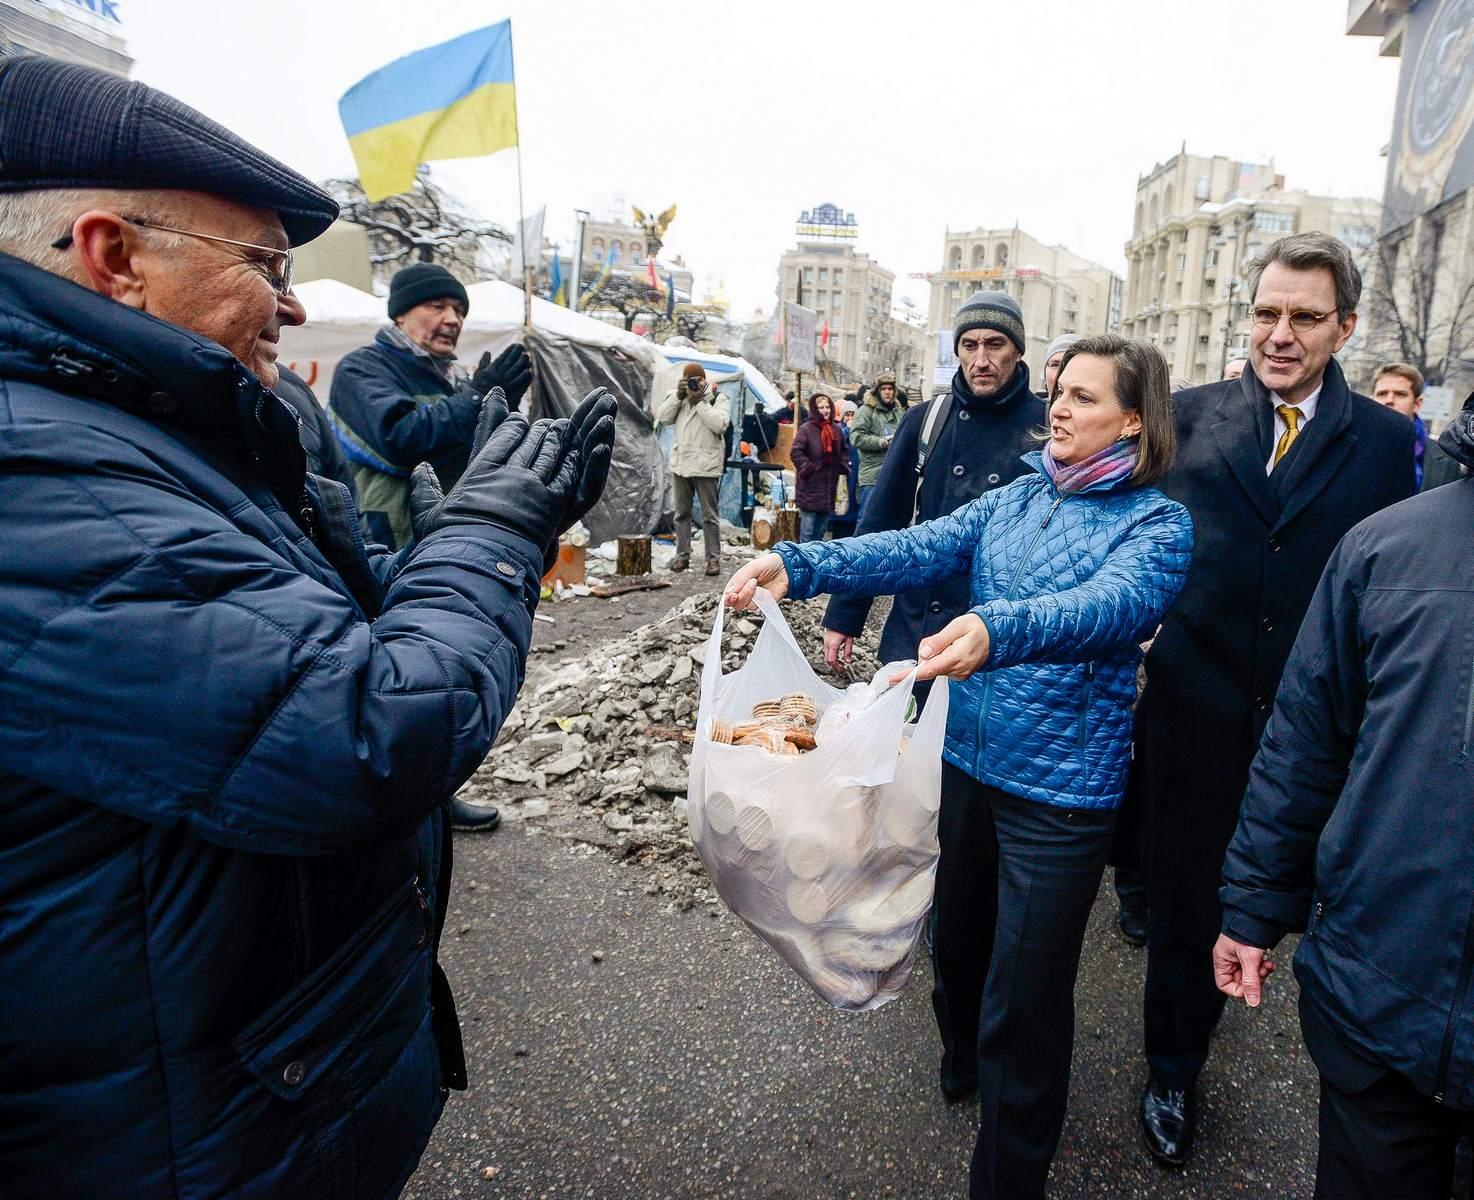 Зам. госсекретаря США Виктория Нуланд и посол США на Украине Джефри Пайетт. Киев. Майдан. 10.12.2013/ Фото: https://skaramanga-1972.livejournal.com/636024.html?view=comments